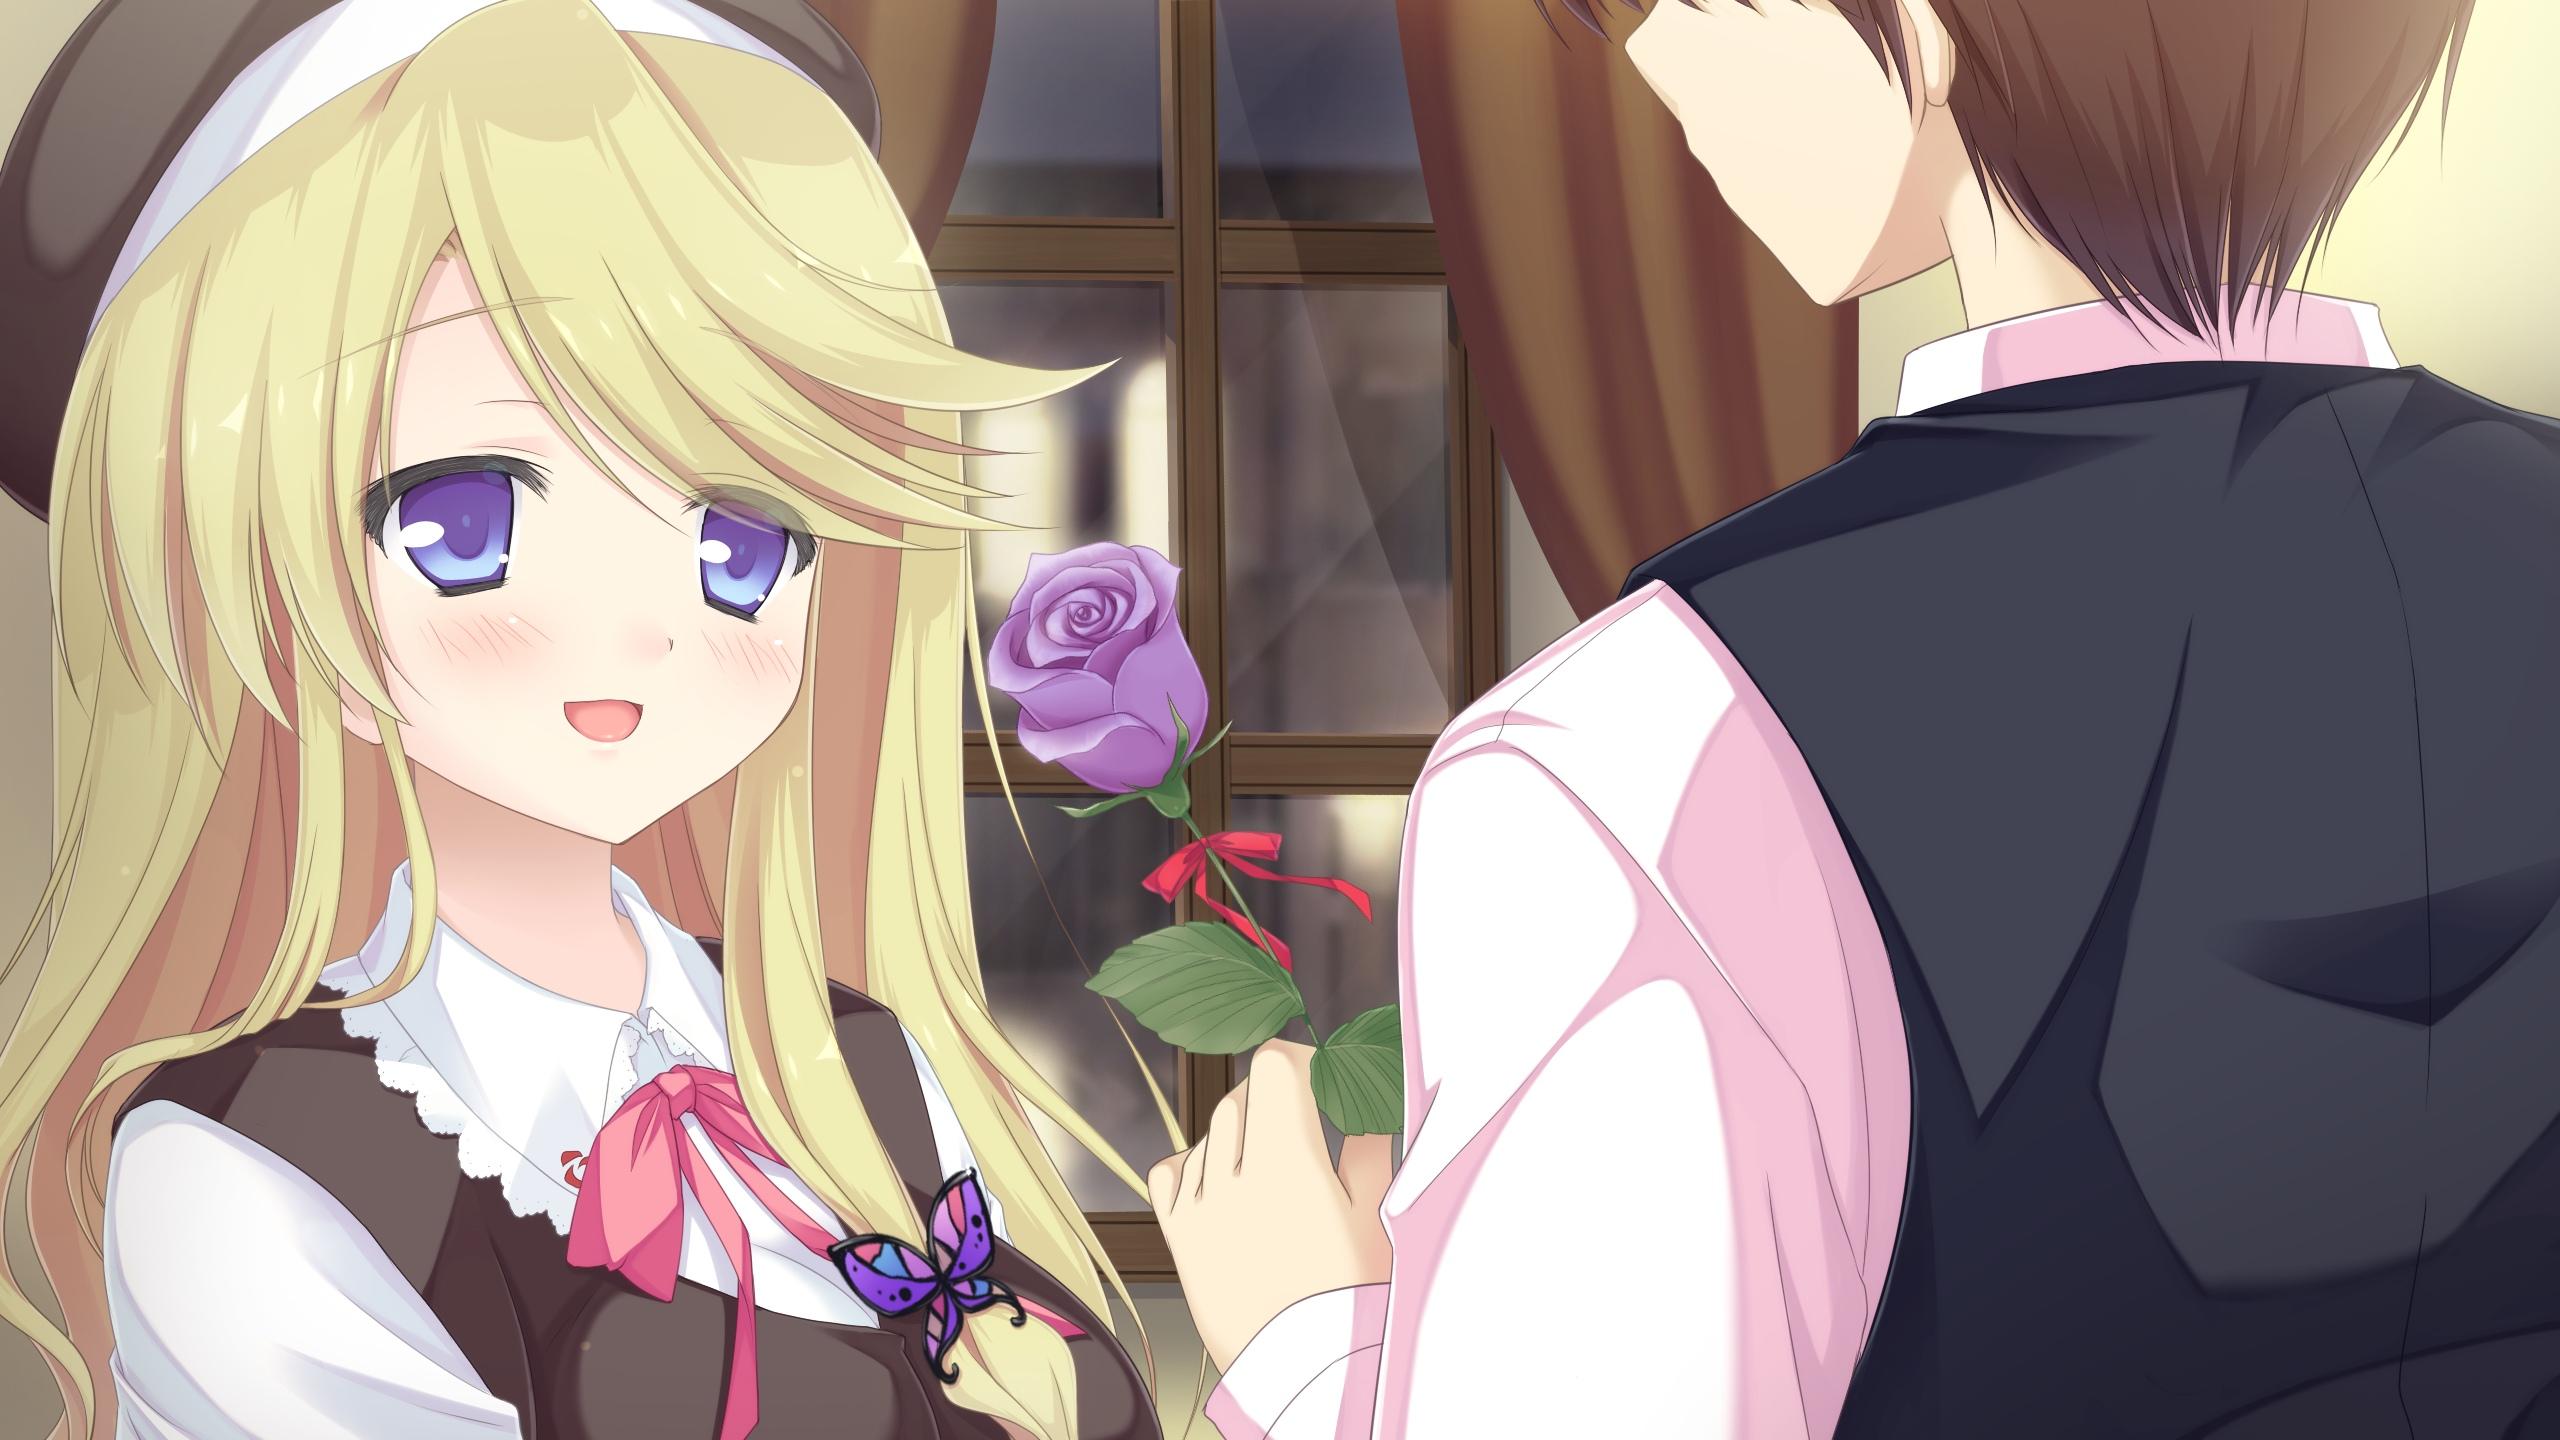 Unduh 3000+ Wallpaper Anime Romance Zerochan  Terbaru